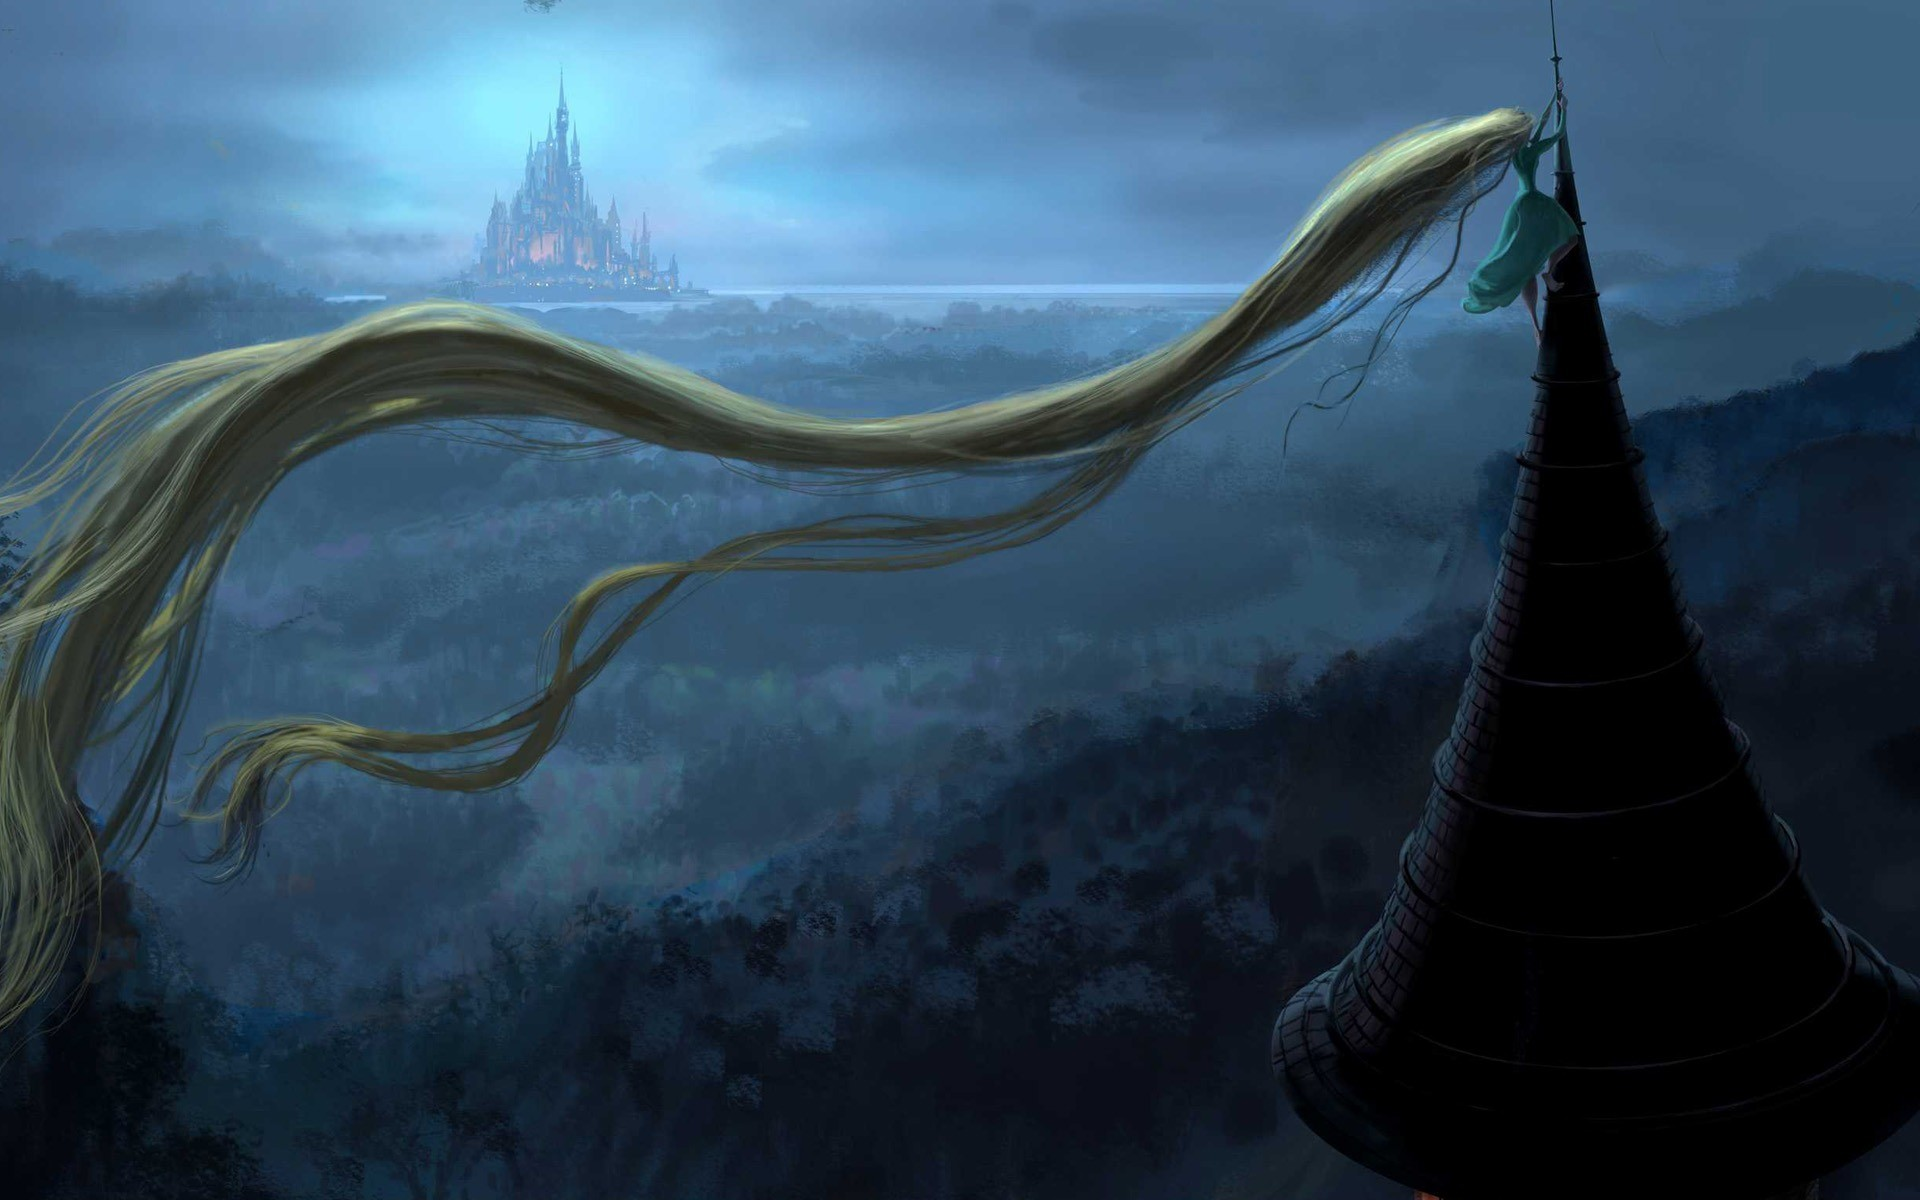 Tangled images Rapunzel wallpaper and background photos 1280×1024 Tangled  Rapunzel Wallpapers (45 Wallpapers)   Adorable Wallpapers   Desktop    Pinterest …